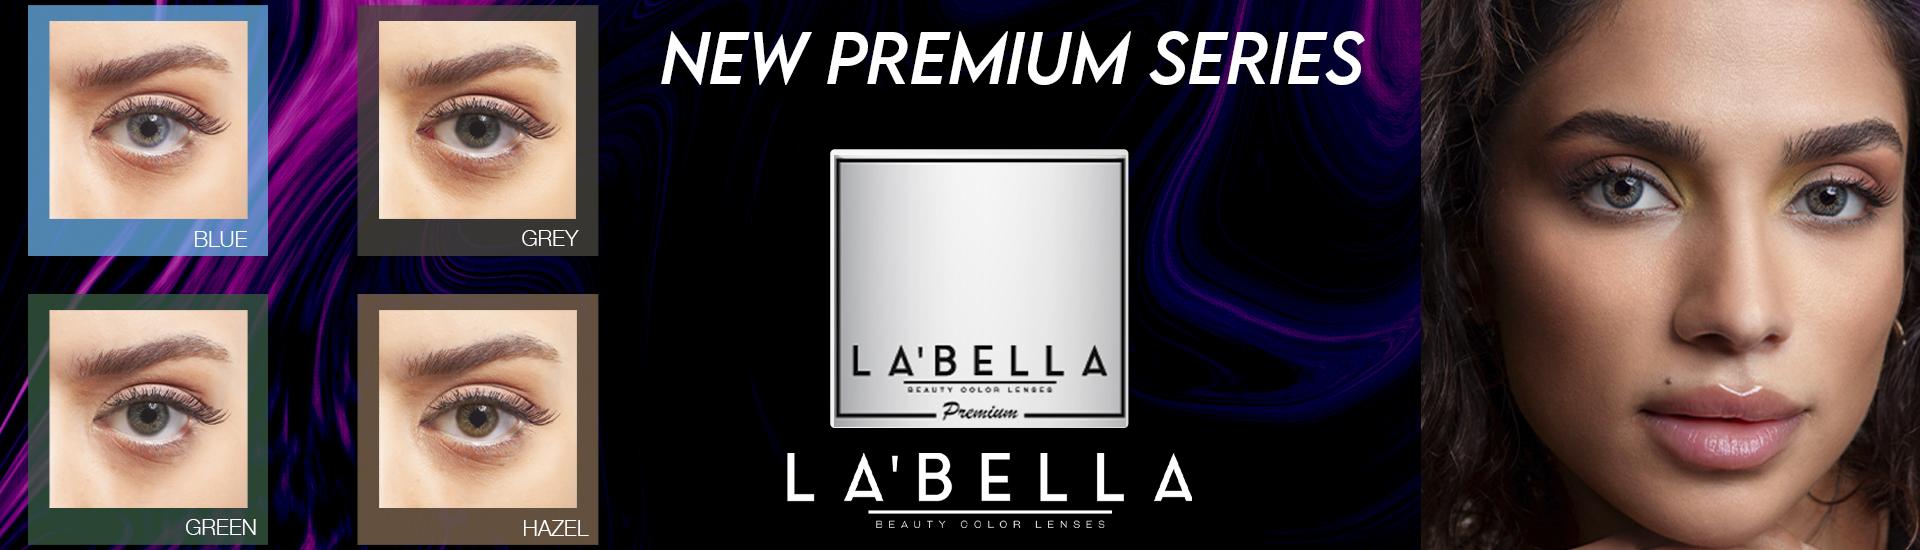 Yeni Premium